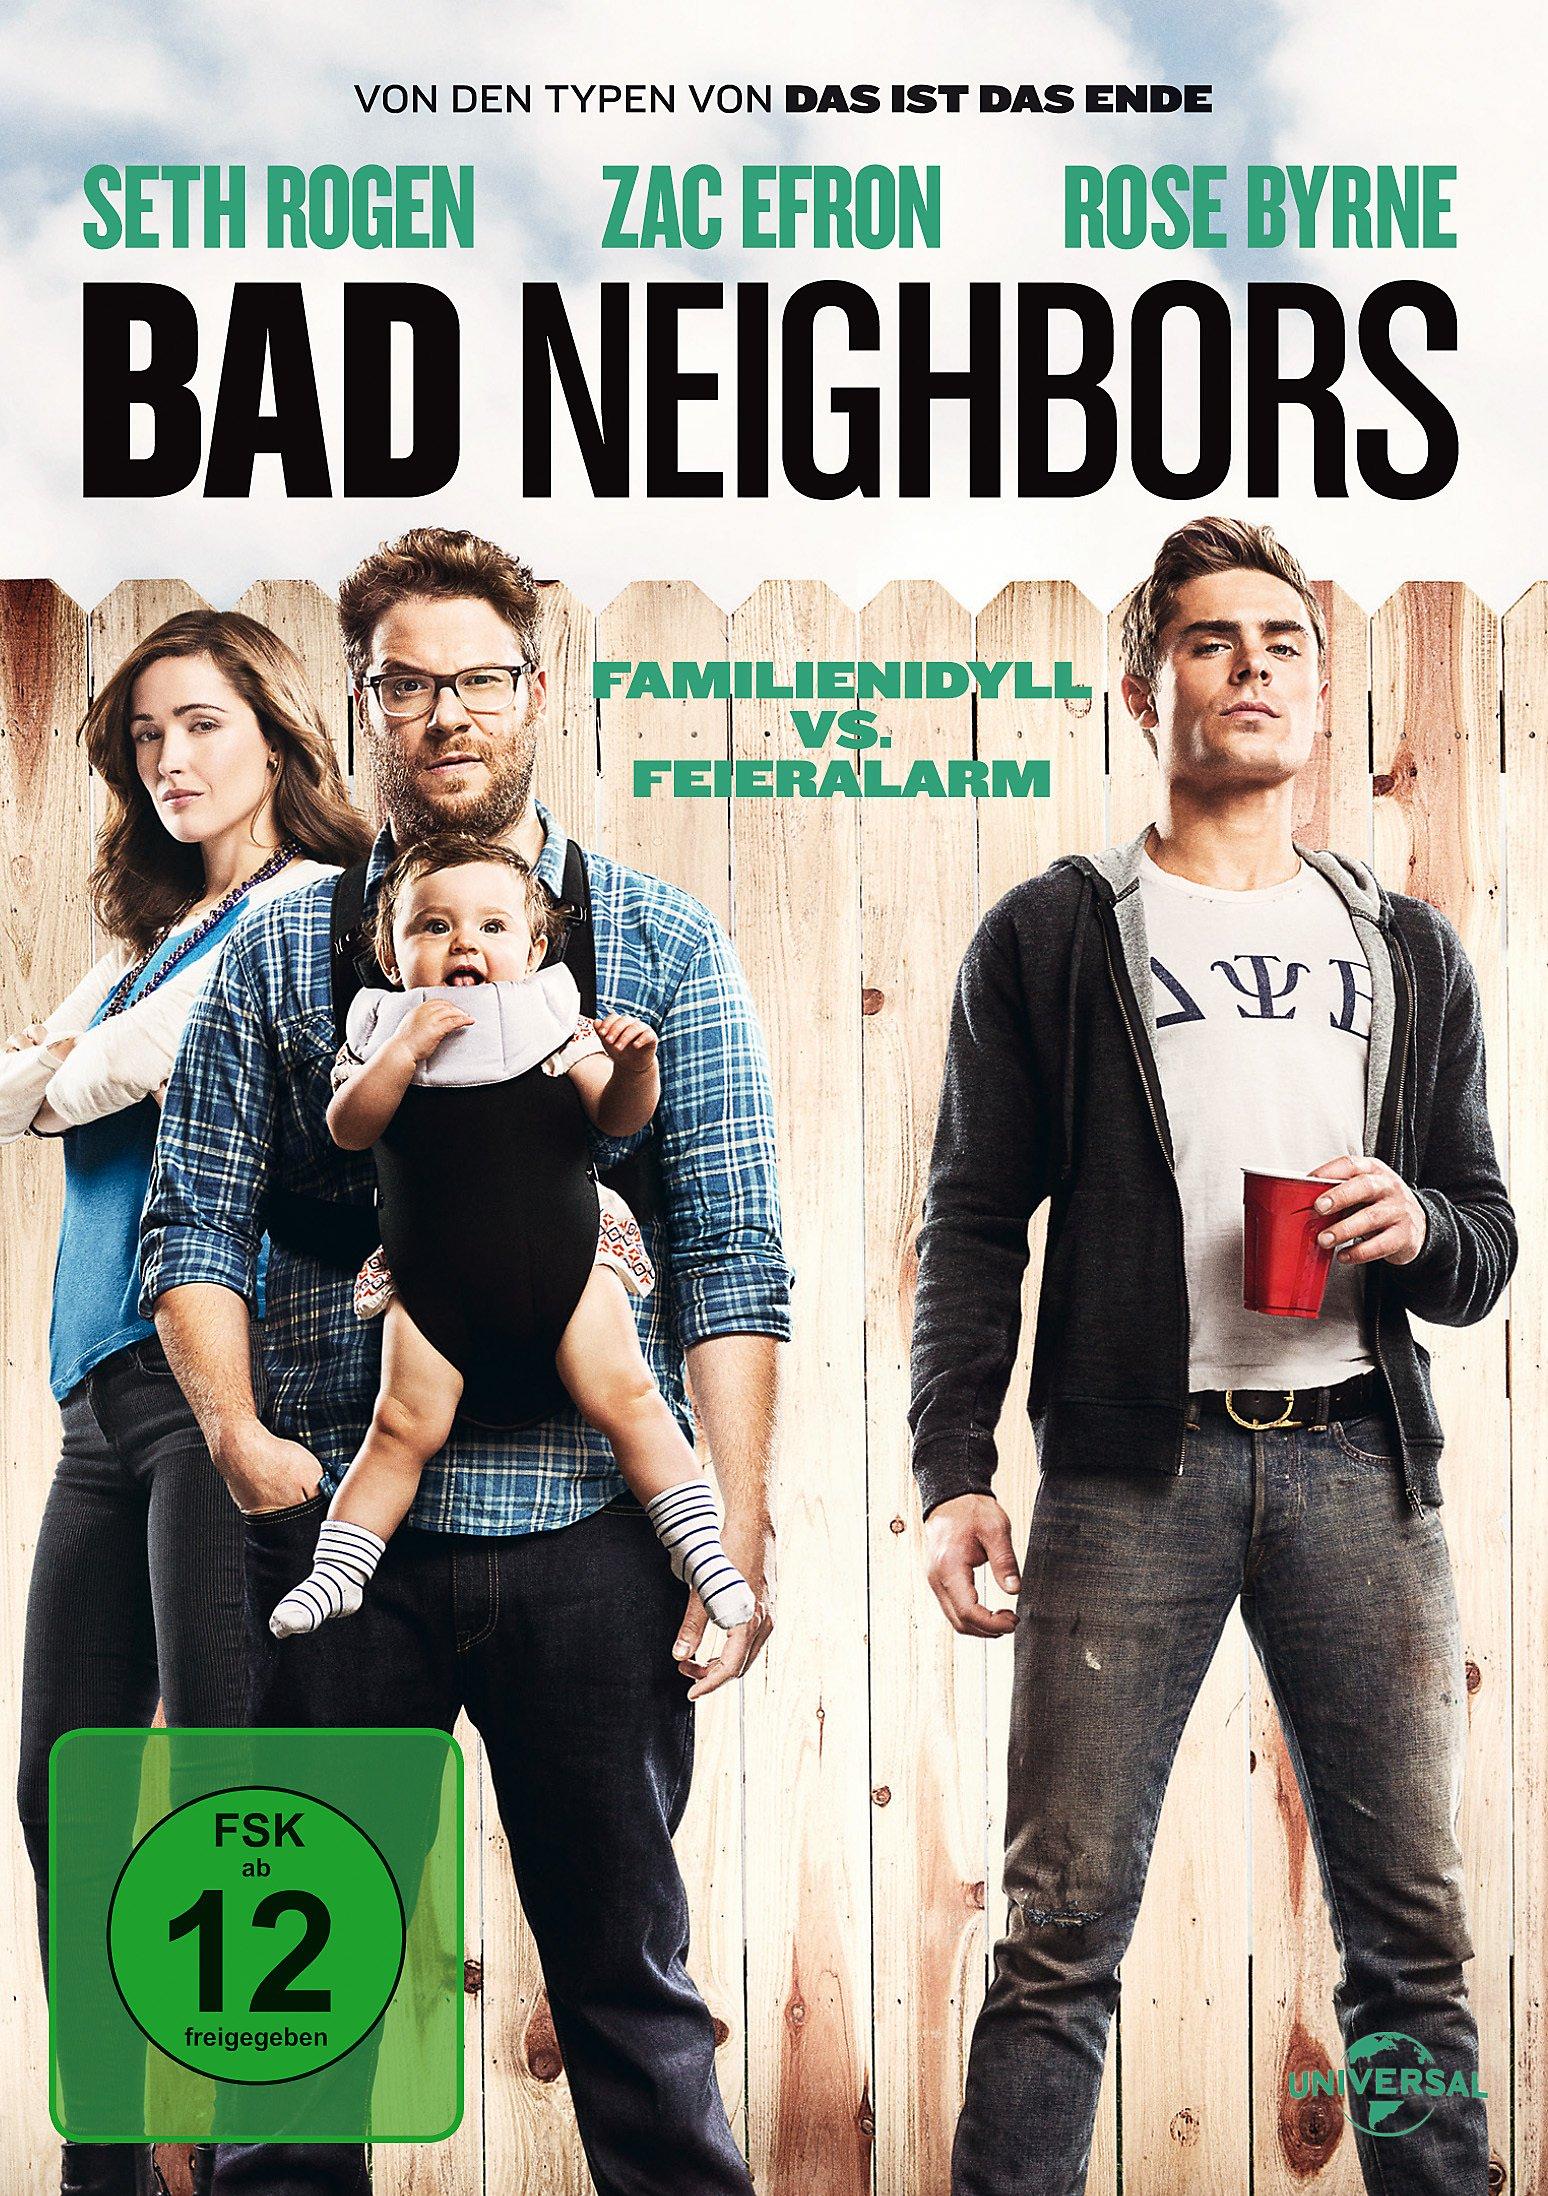 Bad Neighbors DVD jetzt bei Weltbild.ch online bestellen